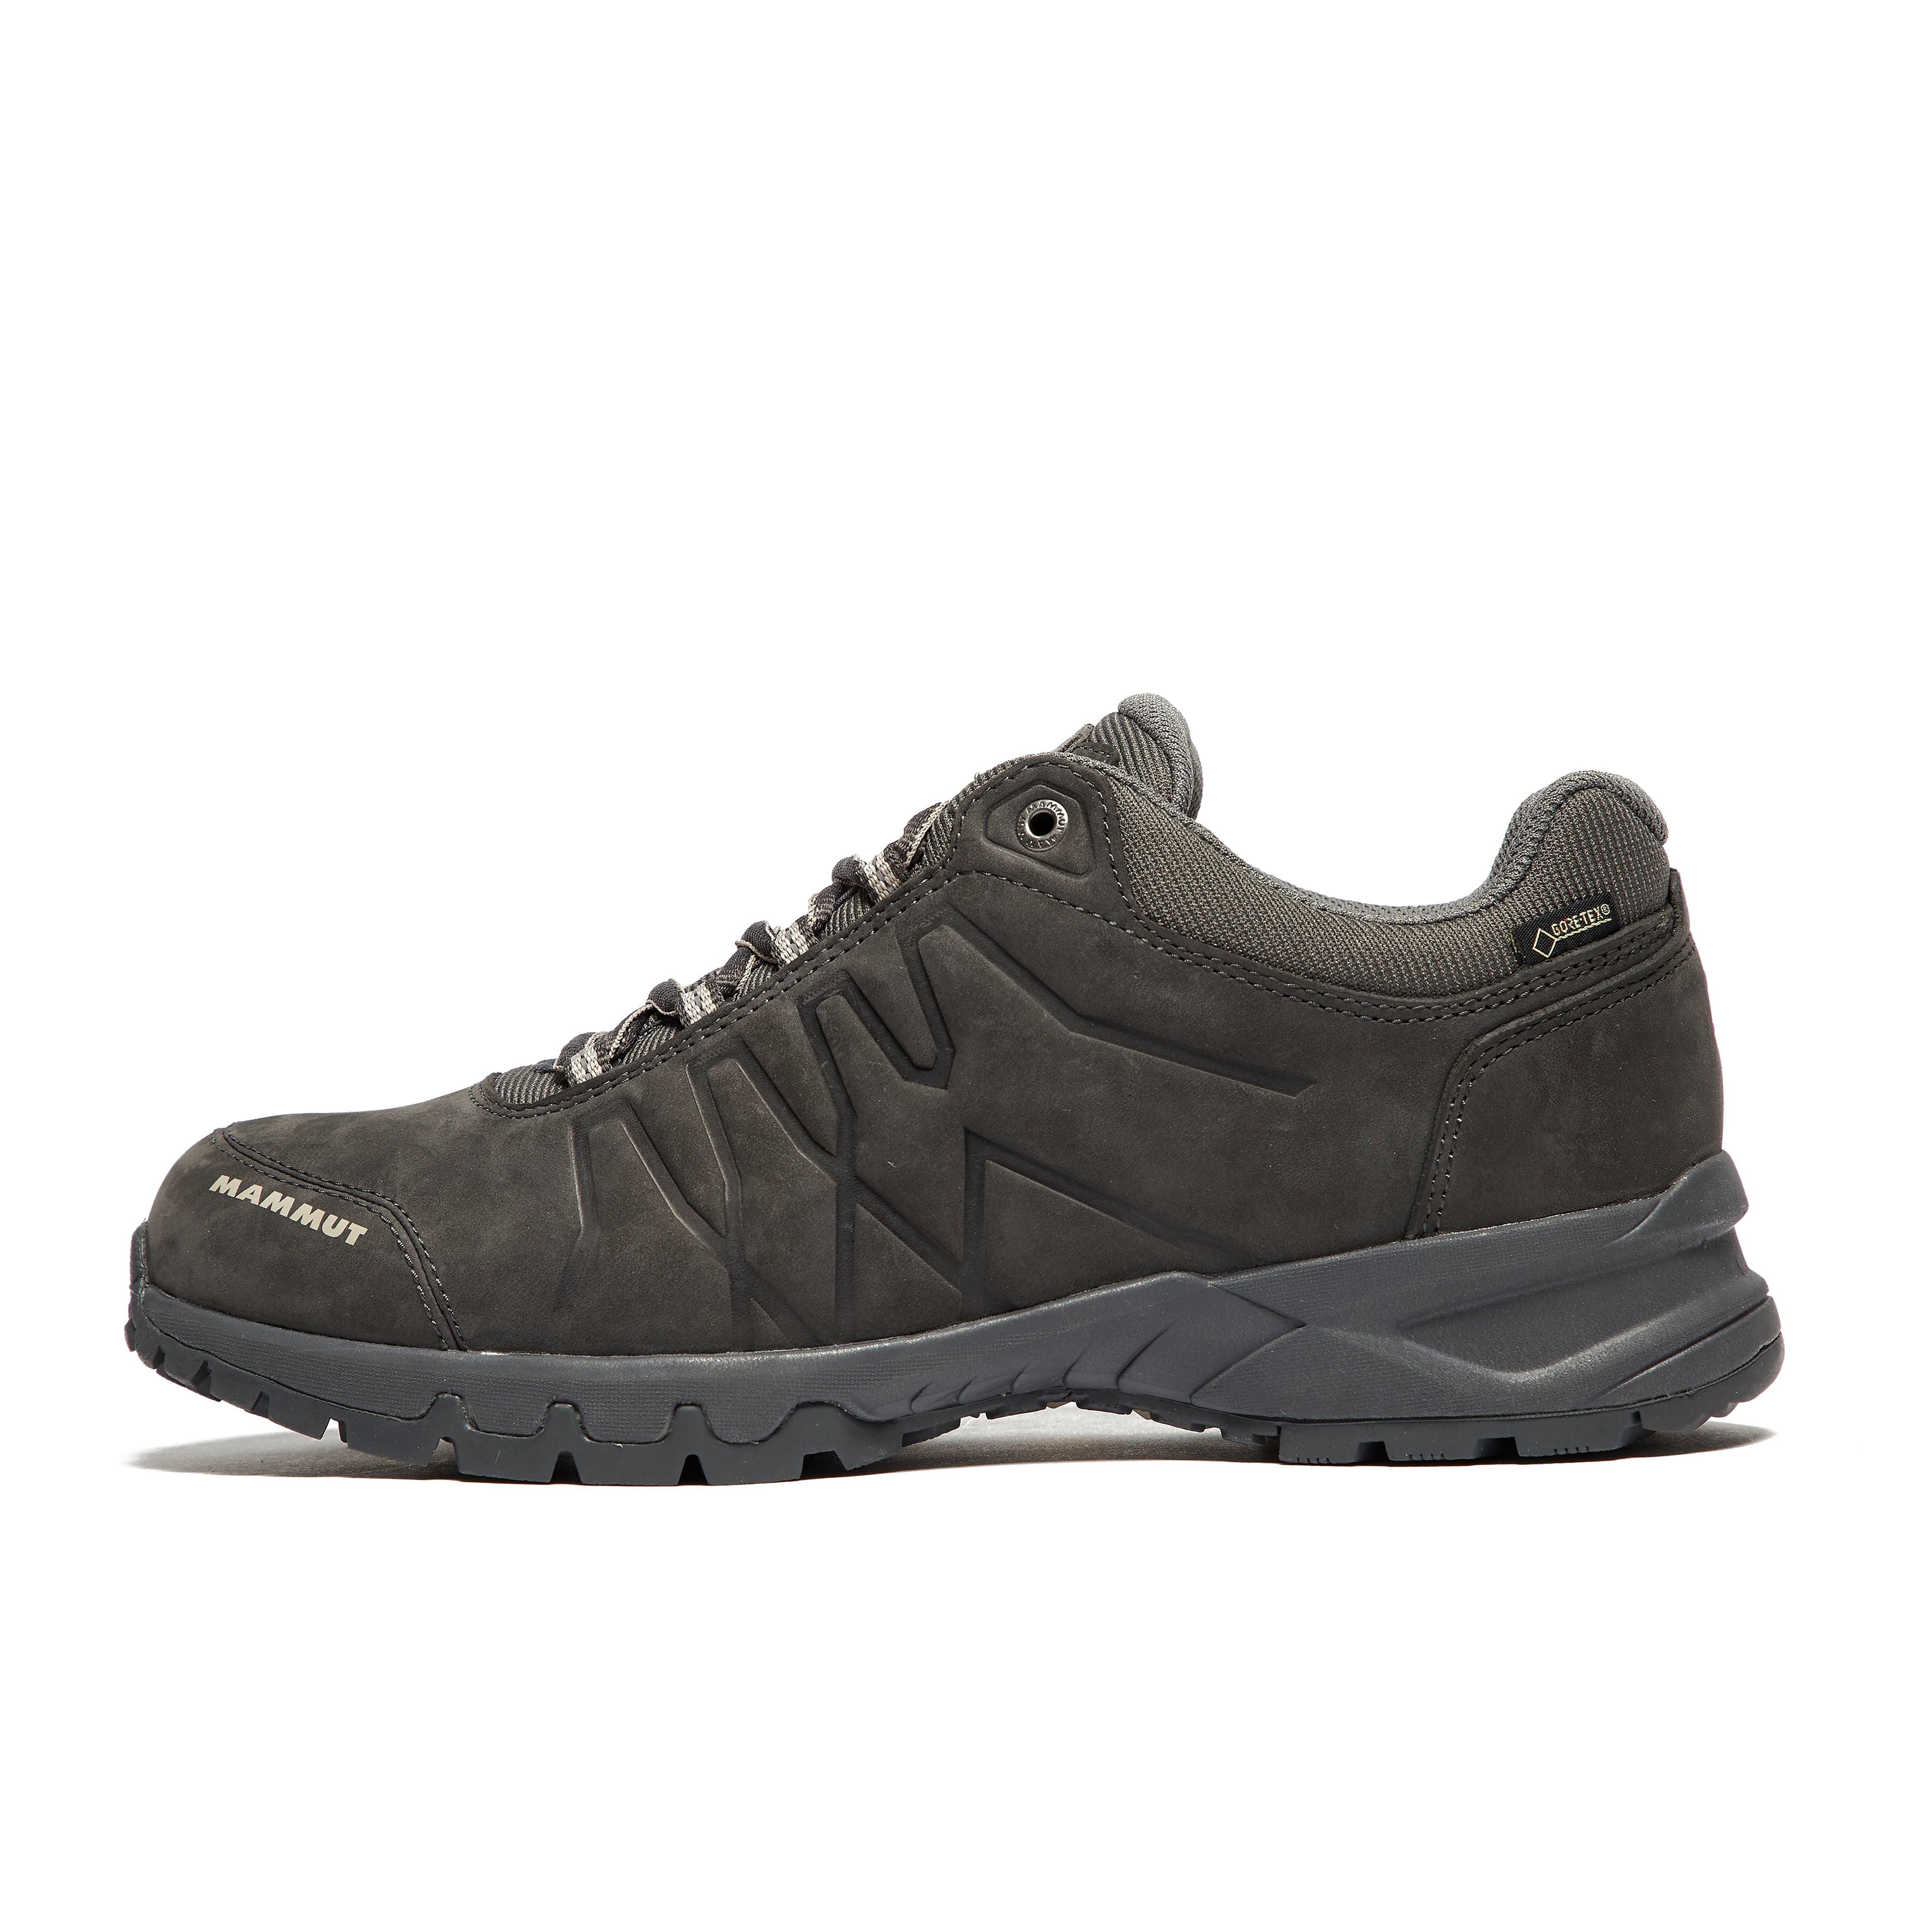 Mammut Mercury III Low GTX Men's Walking Shoes